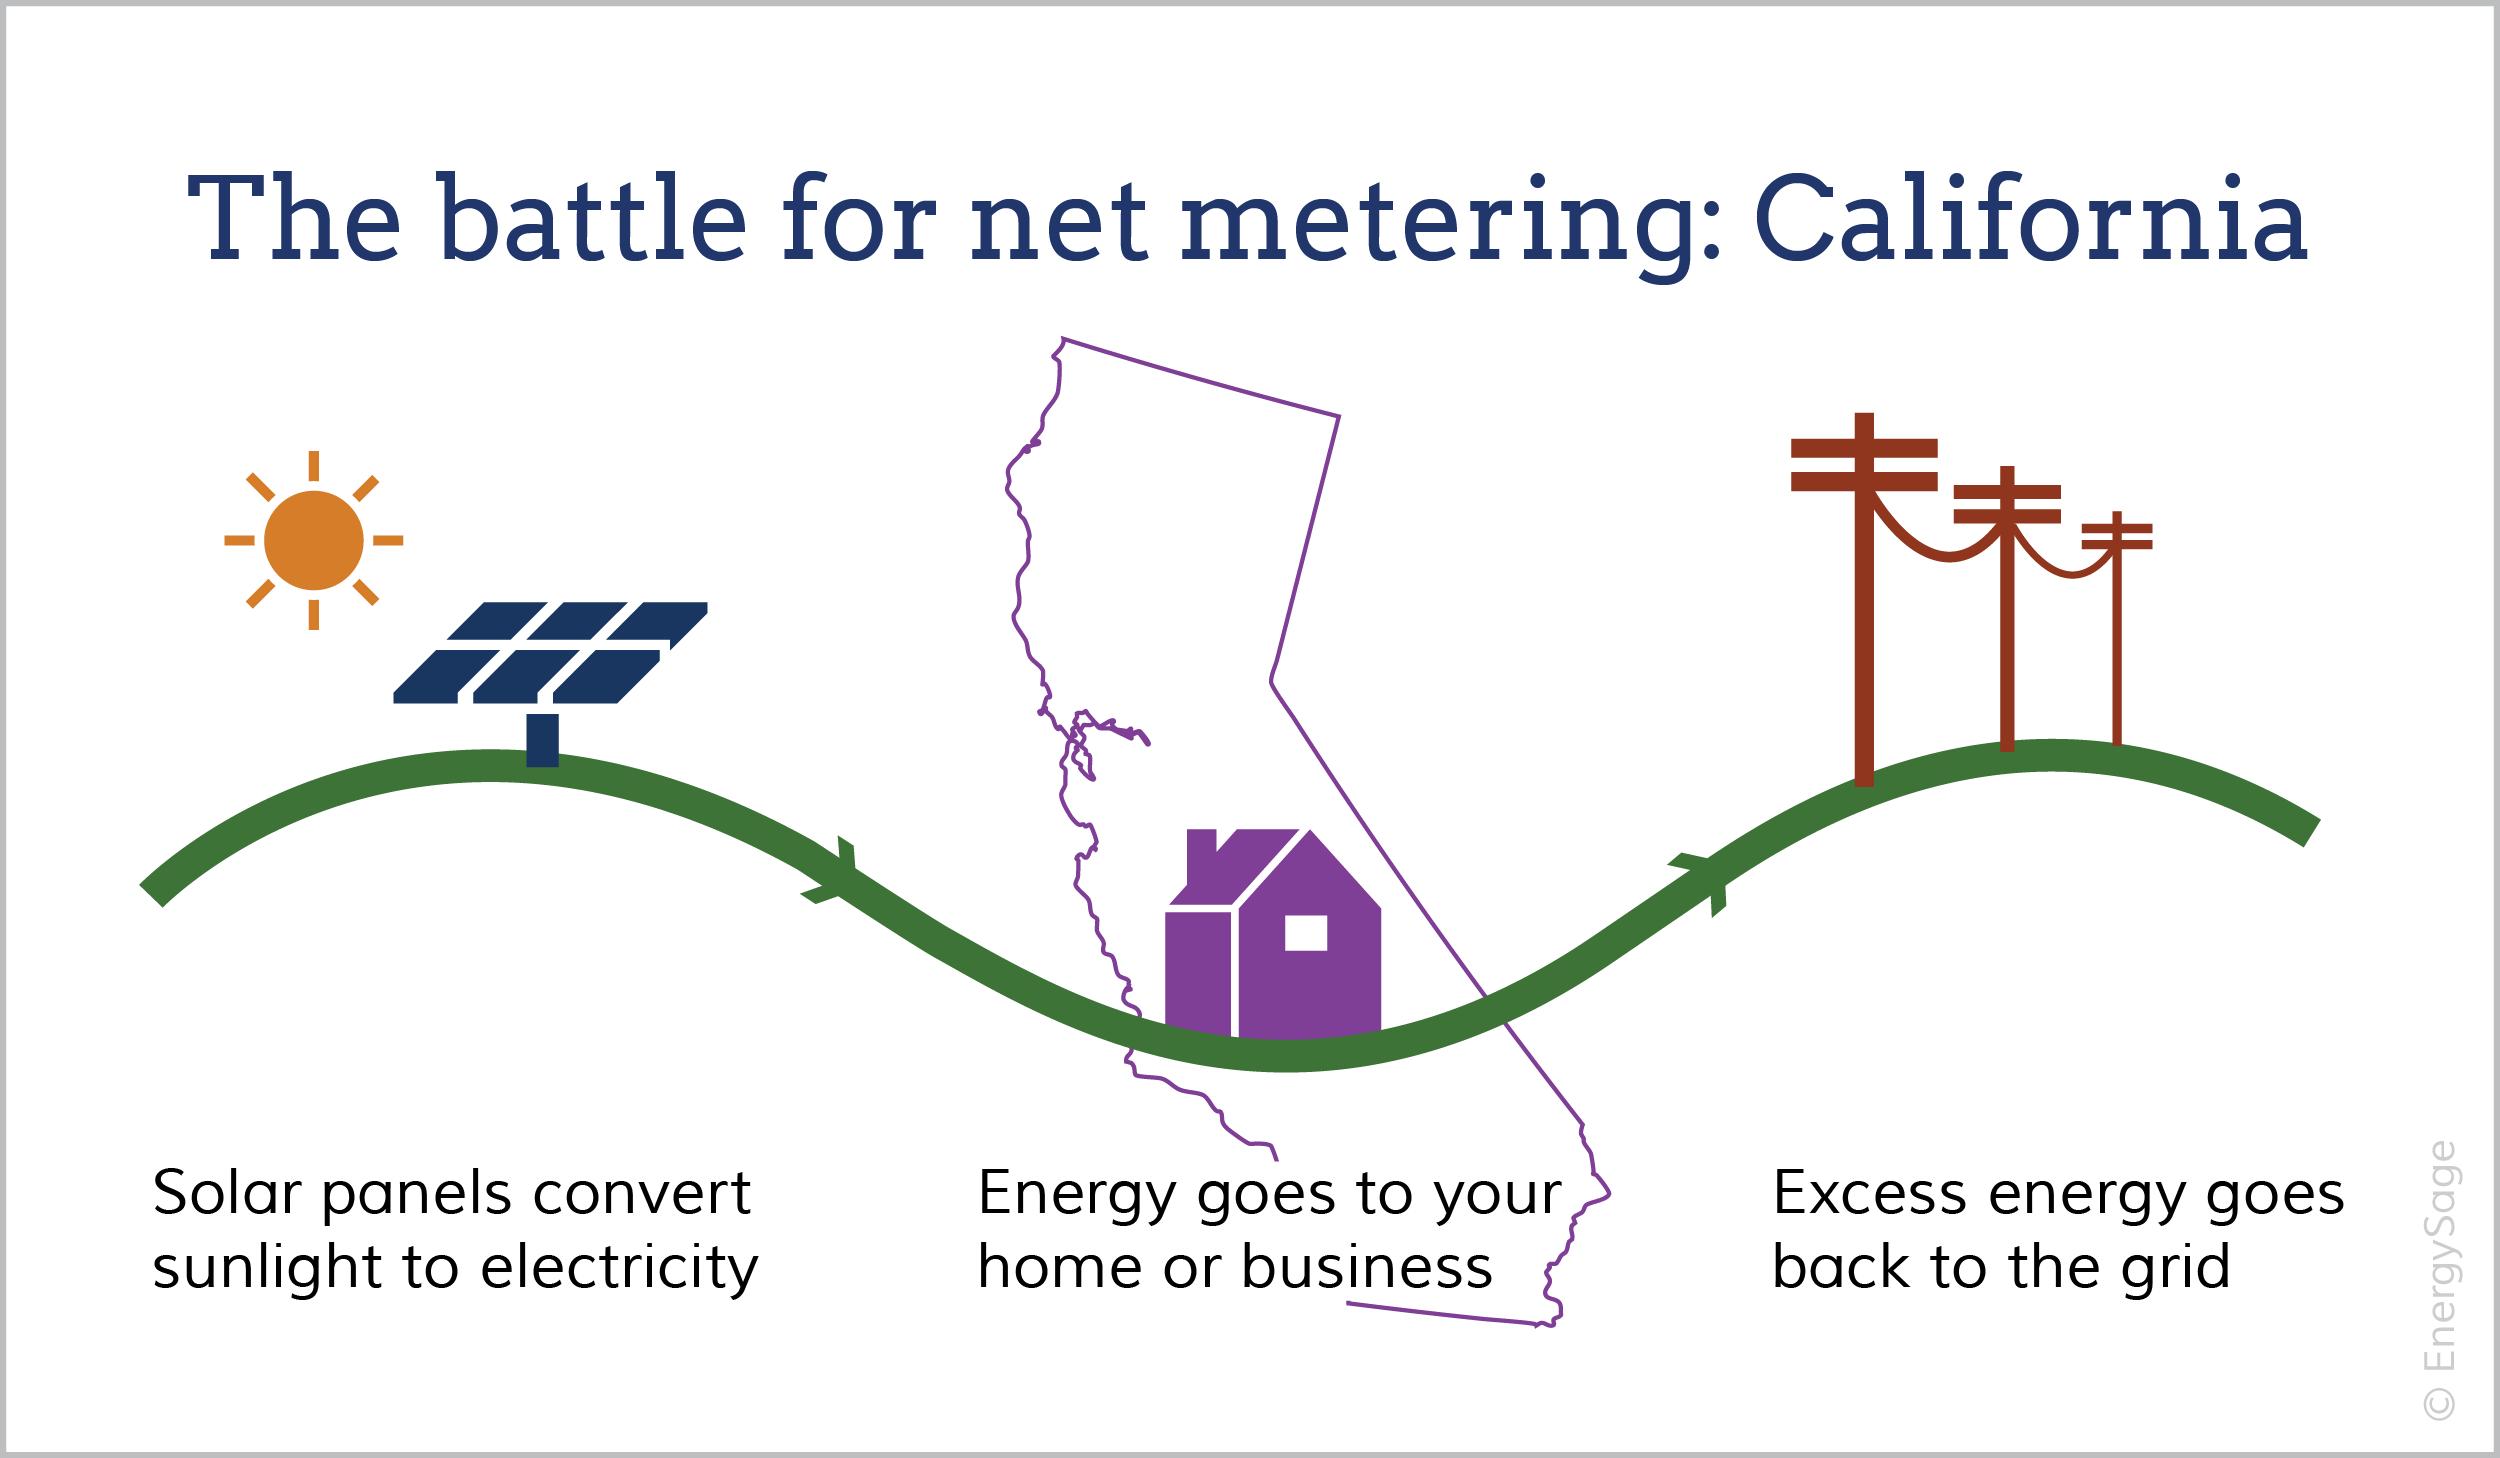 Net metering in California